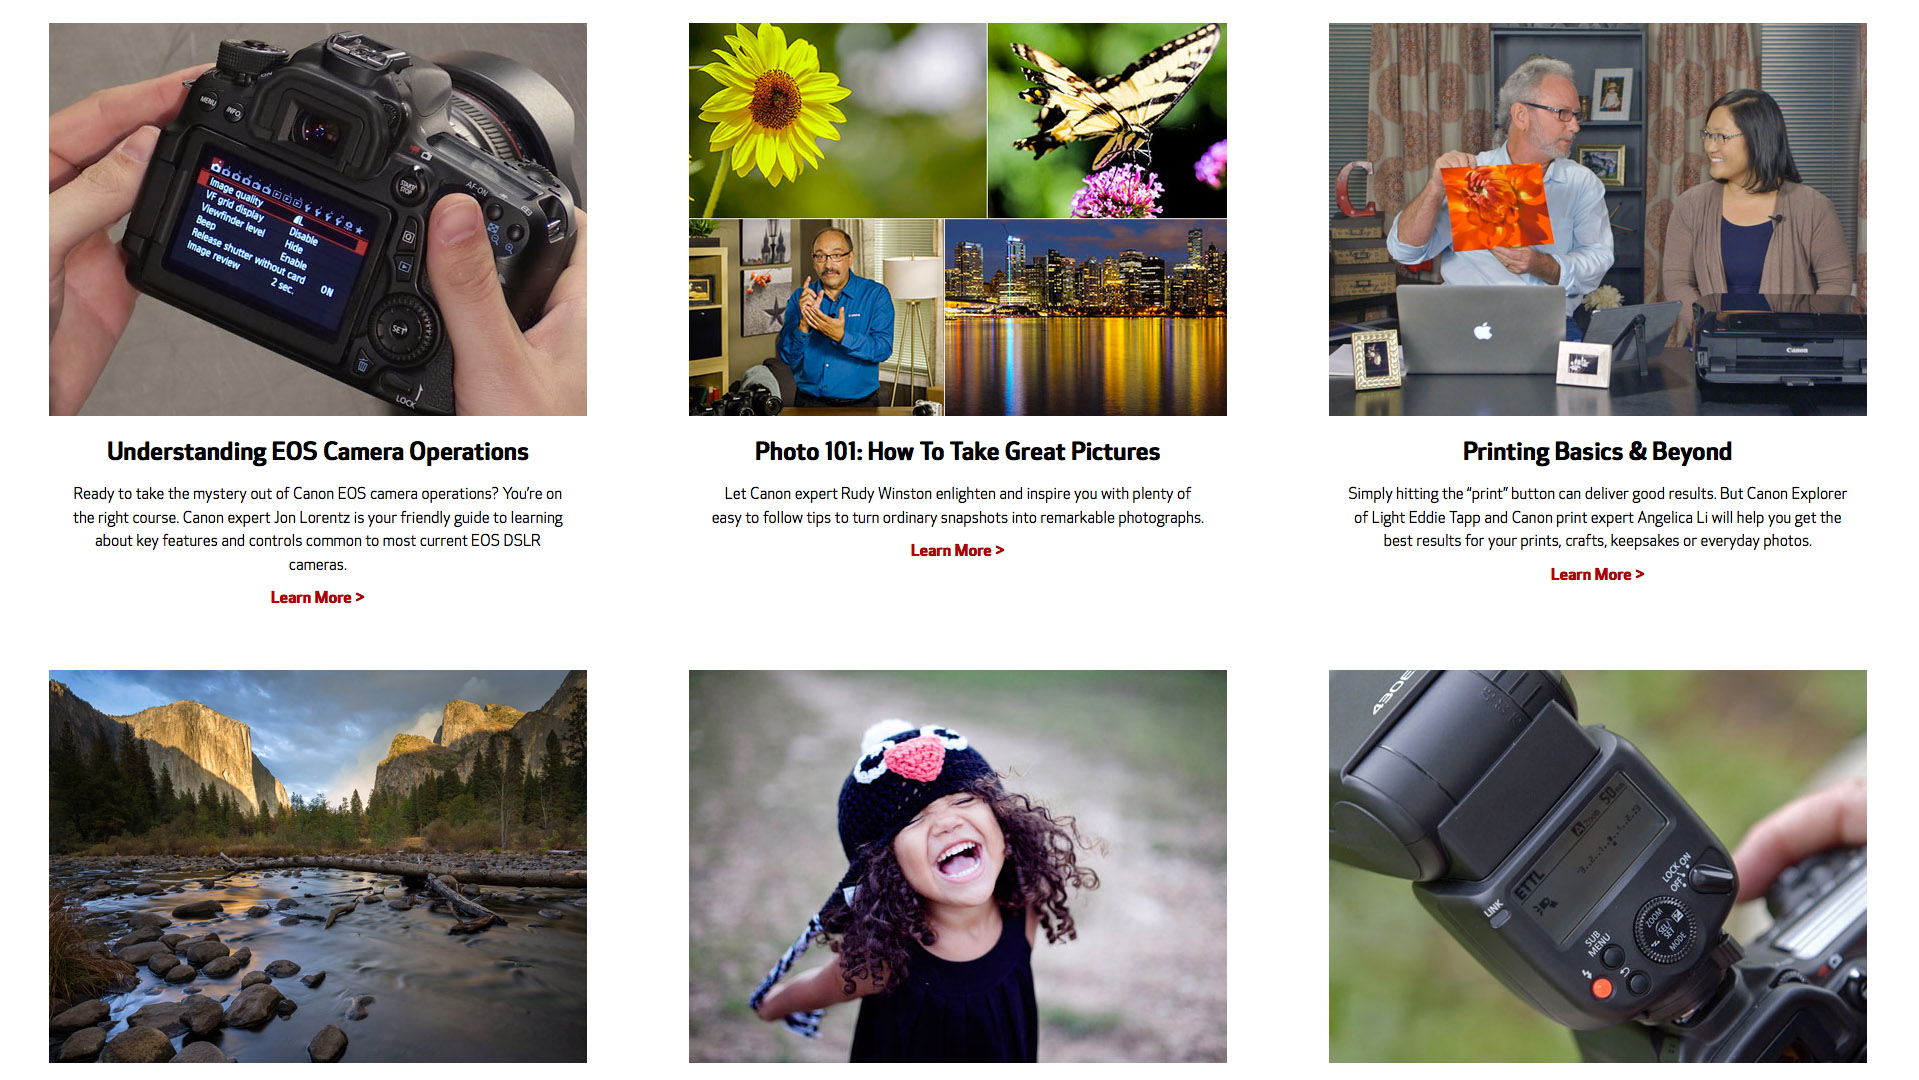 Canon Adds 7 New Online Classes | Photofocus